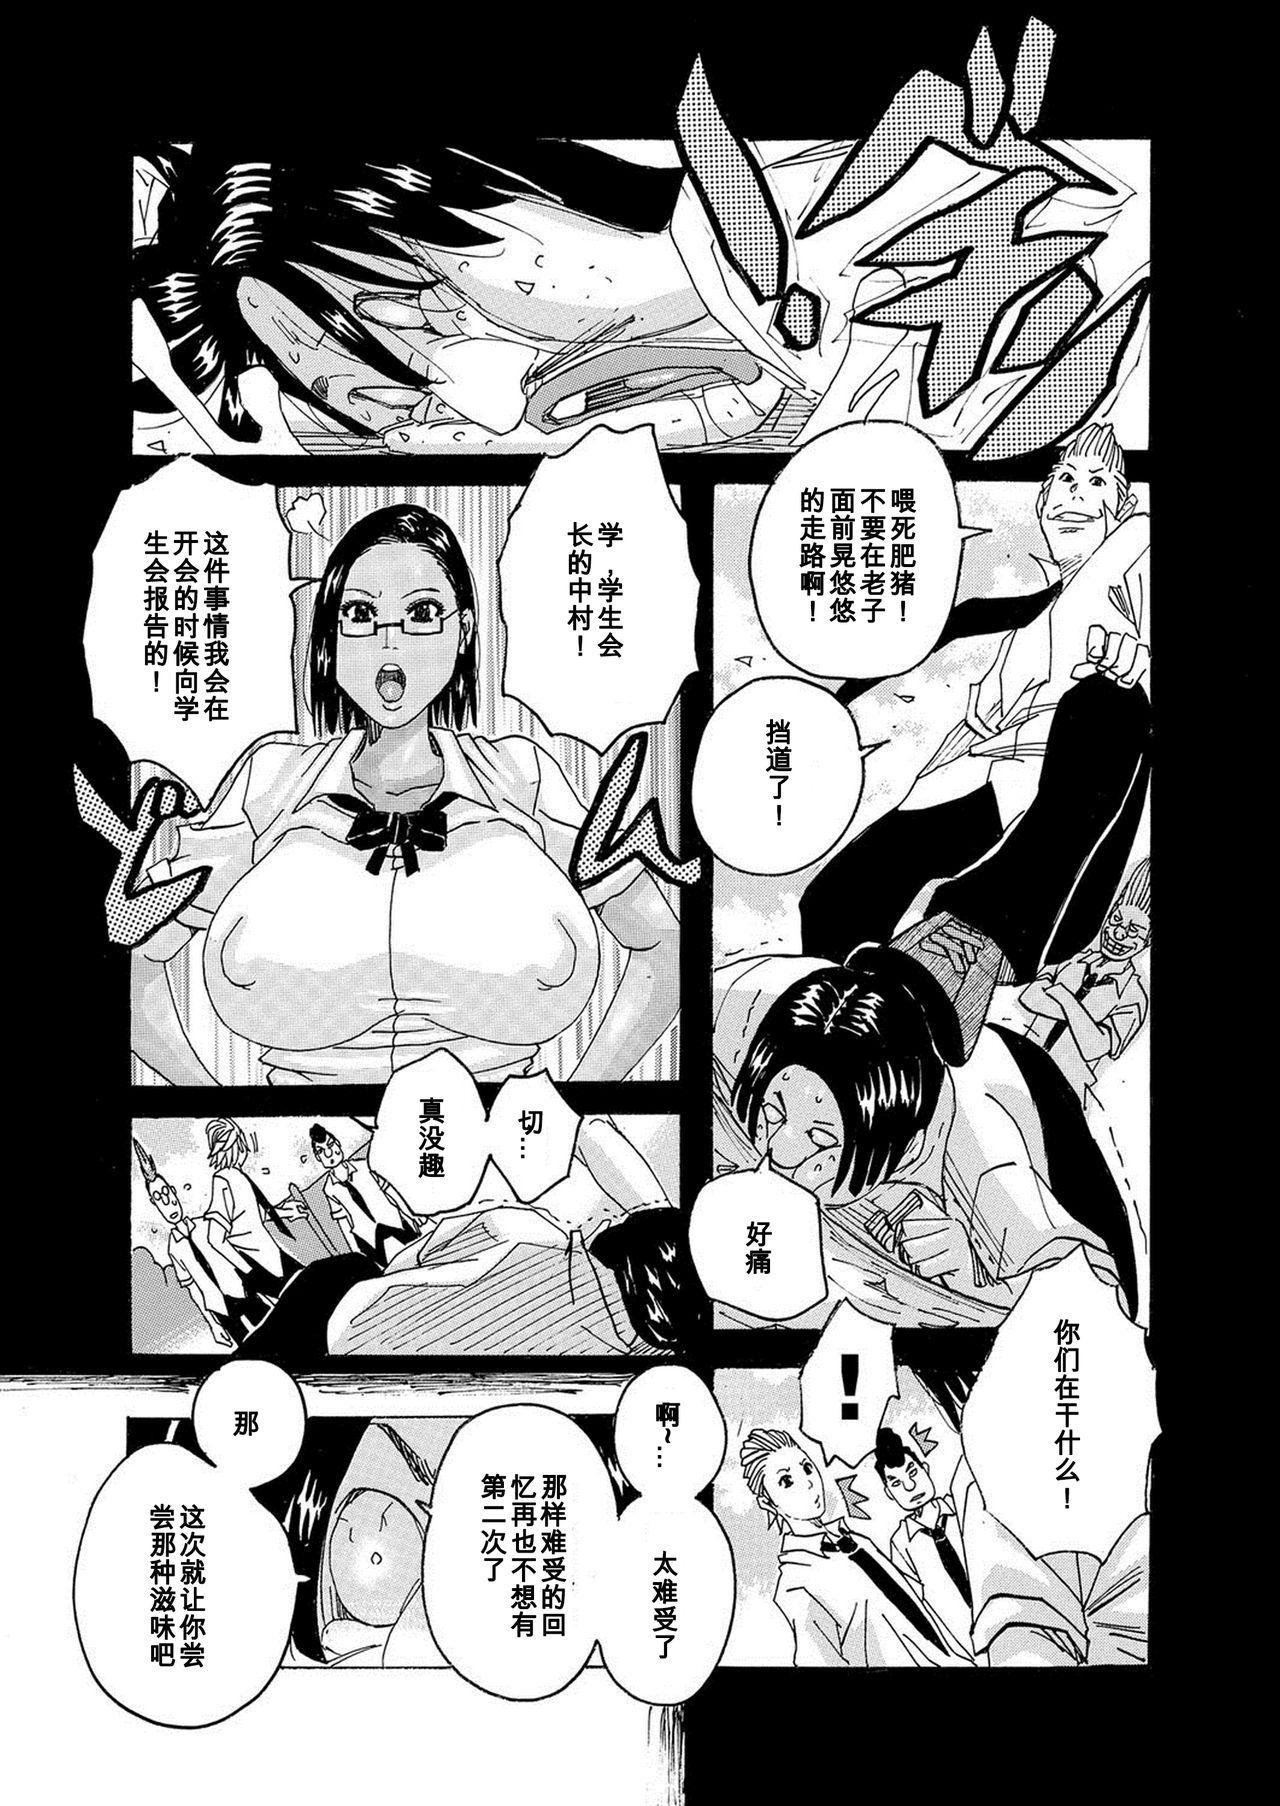 Kinjutsu Makali Tooru 5 8